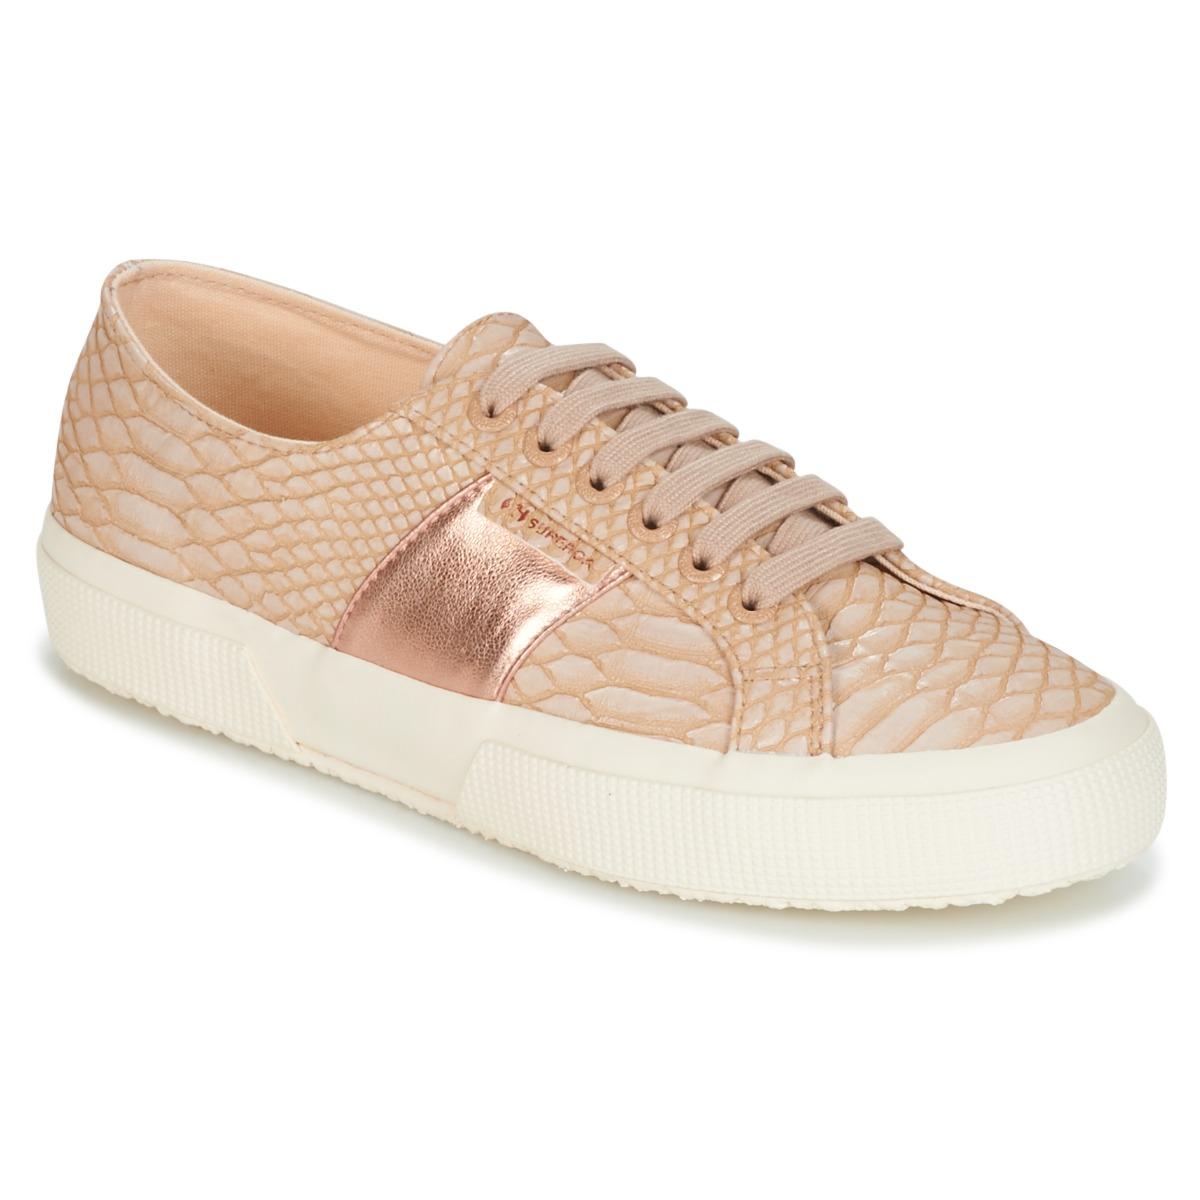 Superga 2750 PU SNAKE W Beige - Kostenloser Versand bei Spartoode ! - Schuhe Sneaker Low Damen 52,49 €